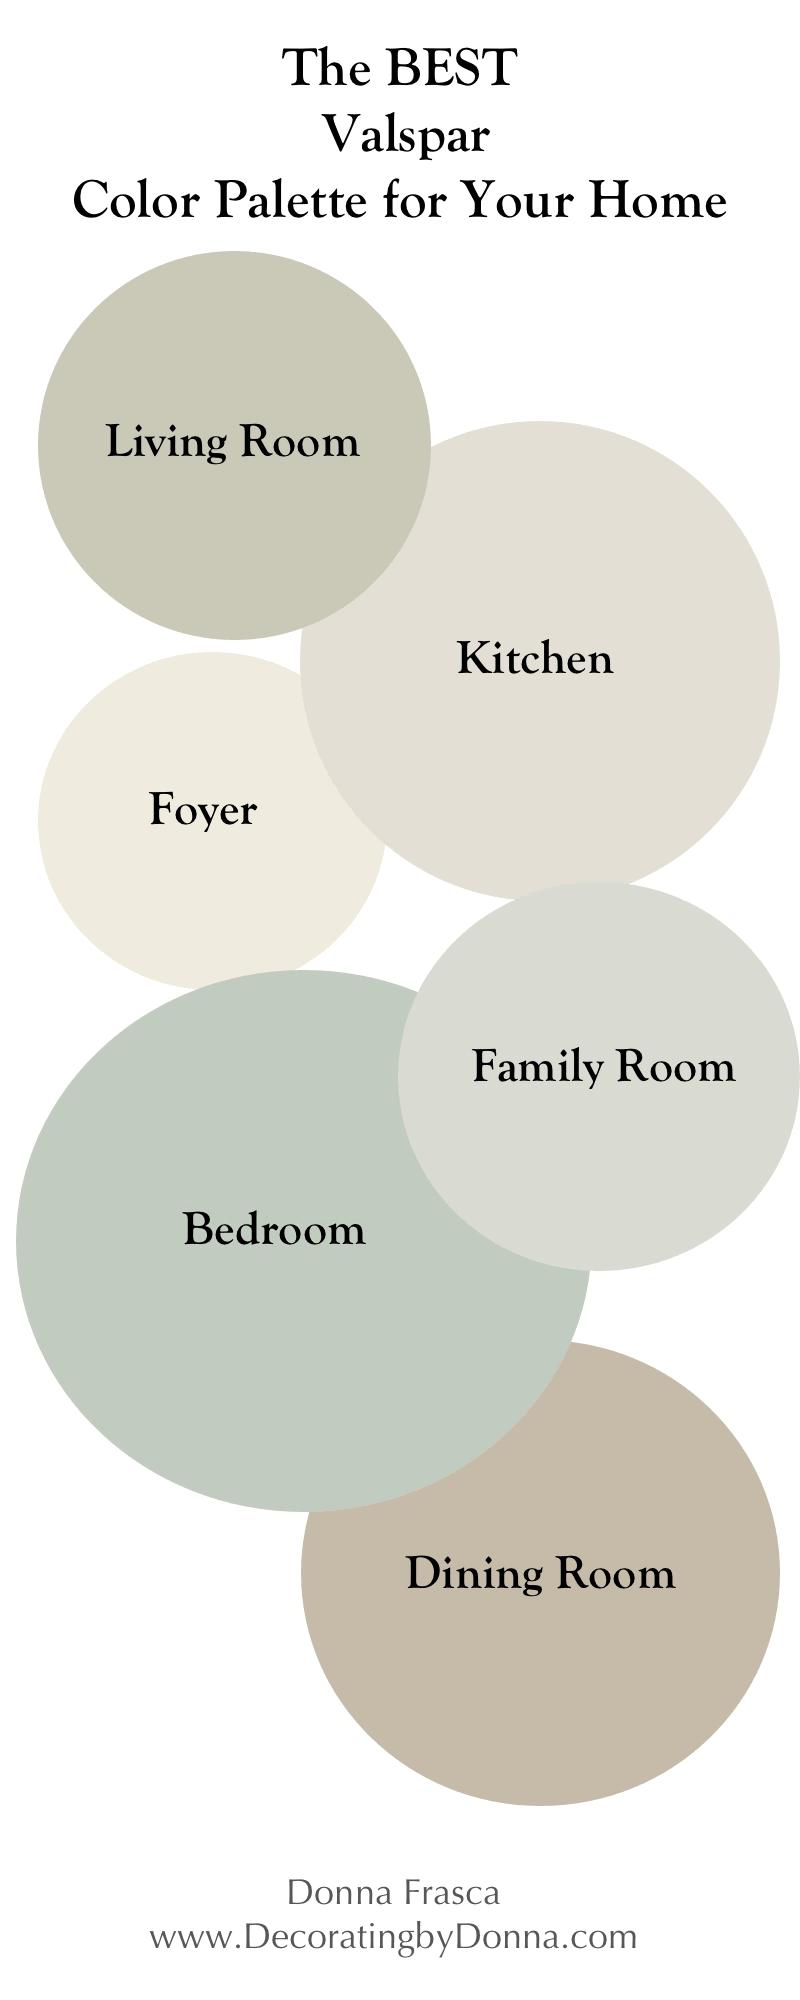 The Best Valspar Color Palette For Your Home Valspar Colors Paint Colors For Home Colorful Interiors